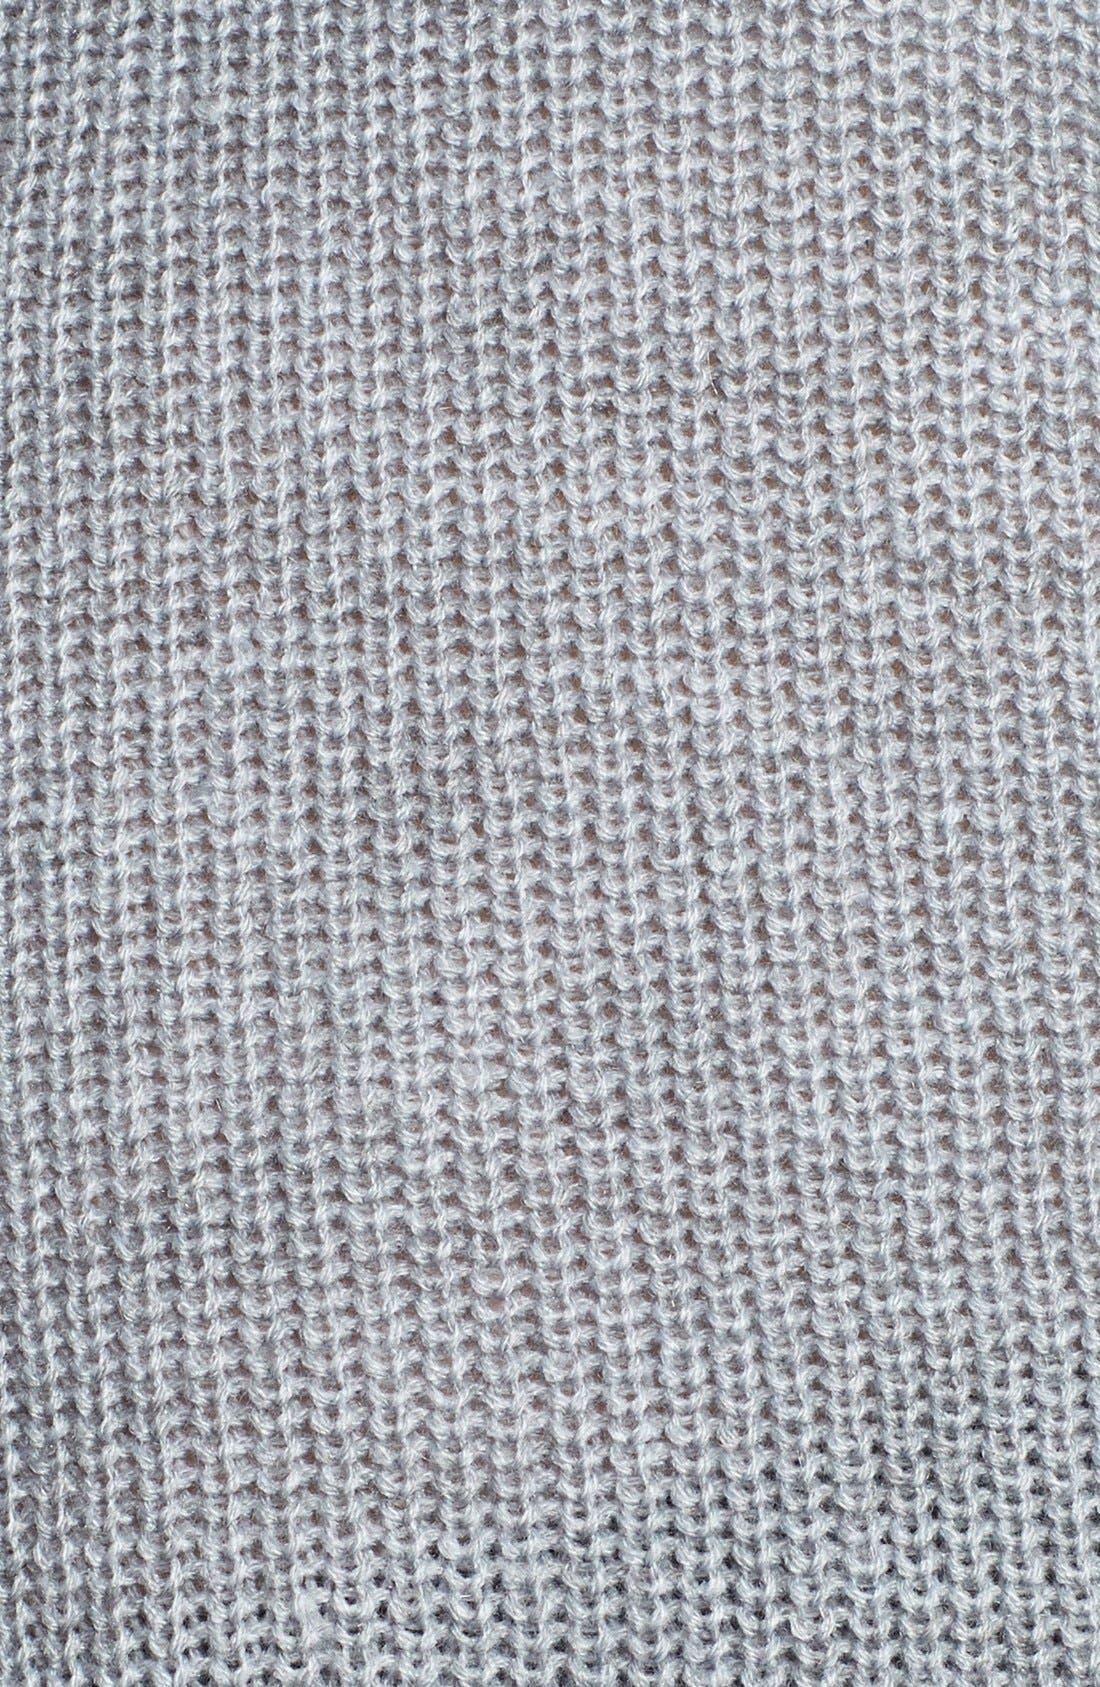 Alternate Image 3  - Jessica Simpson 'Eiffel' Embellished Sweater (Plus Size)